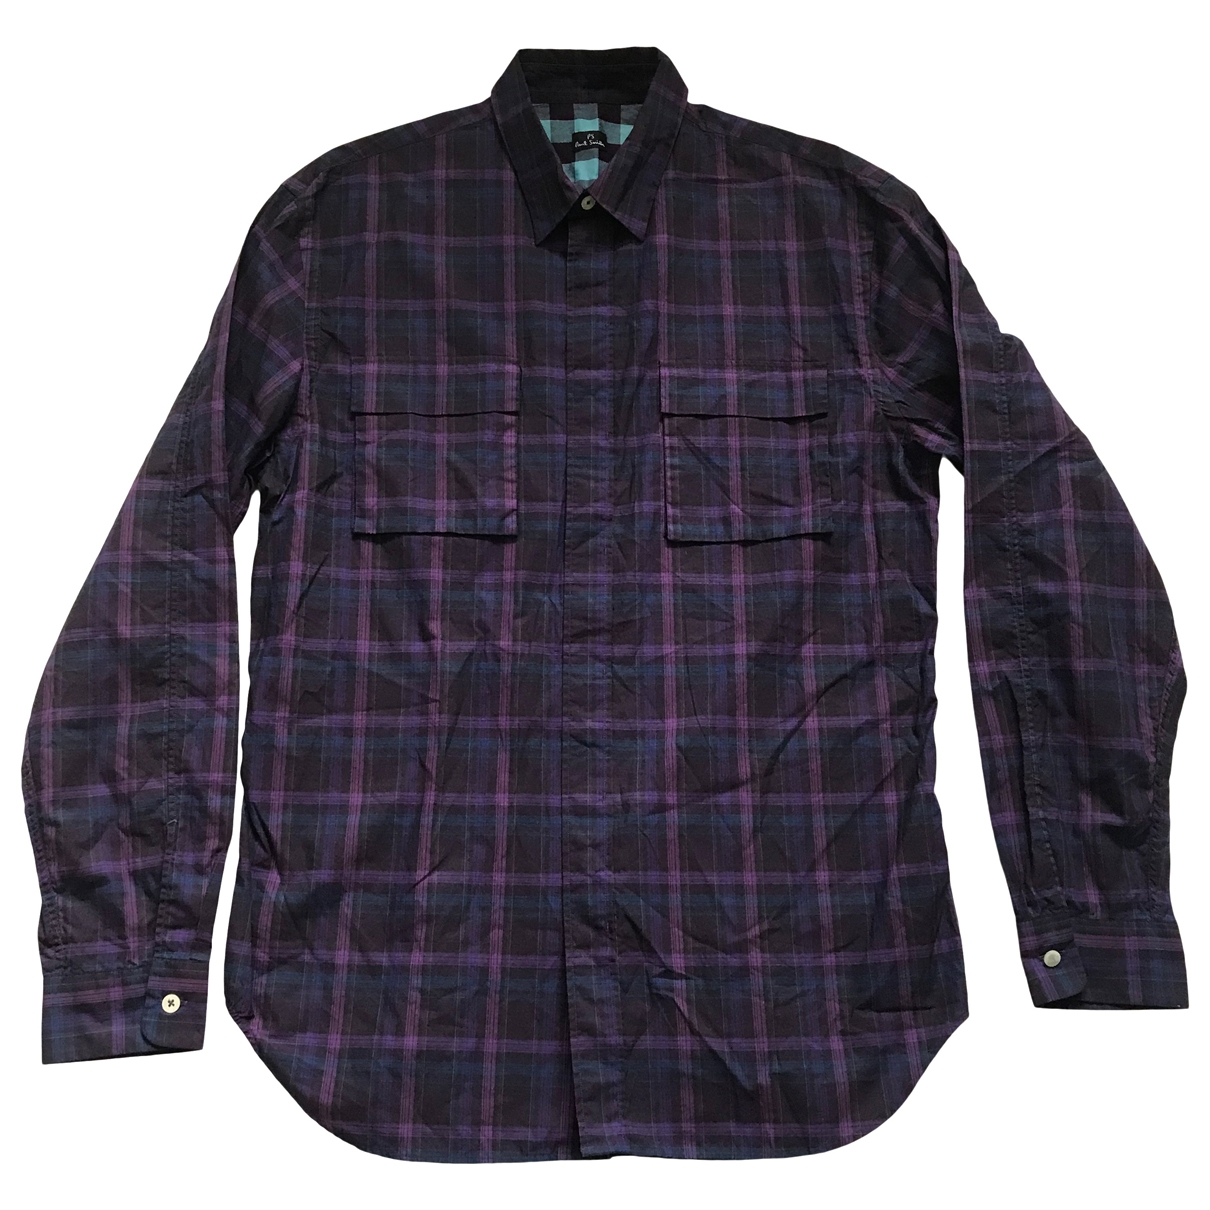 Paul Smith \N Purple Cotton Shirts for Men M International